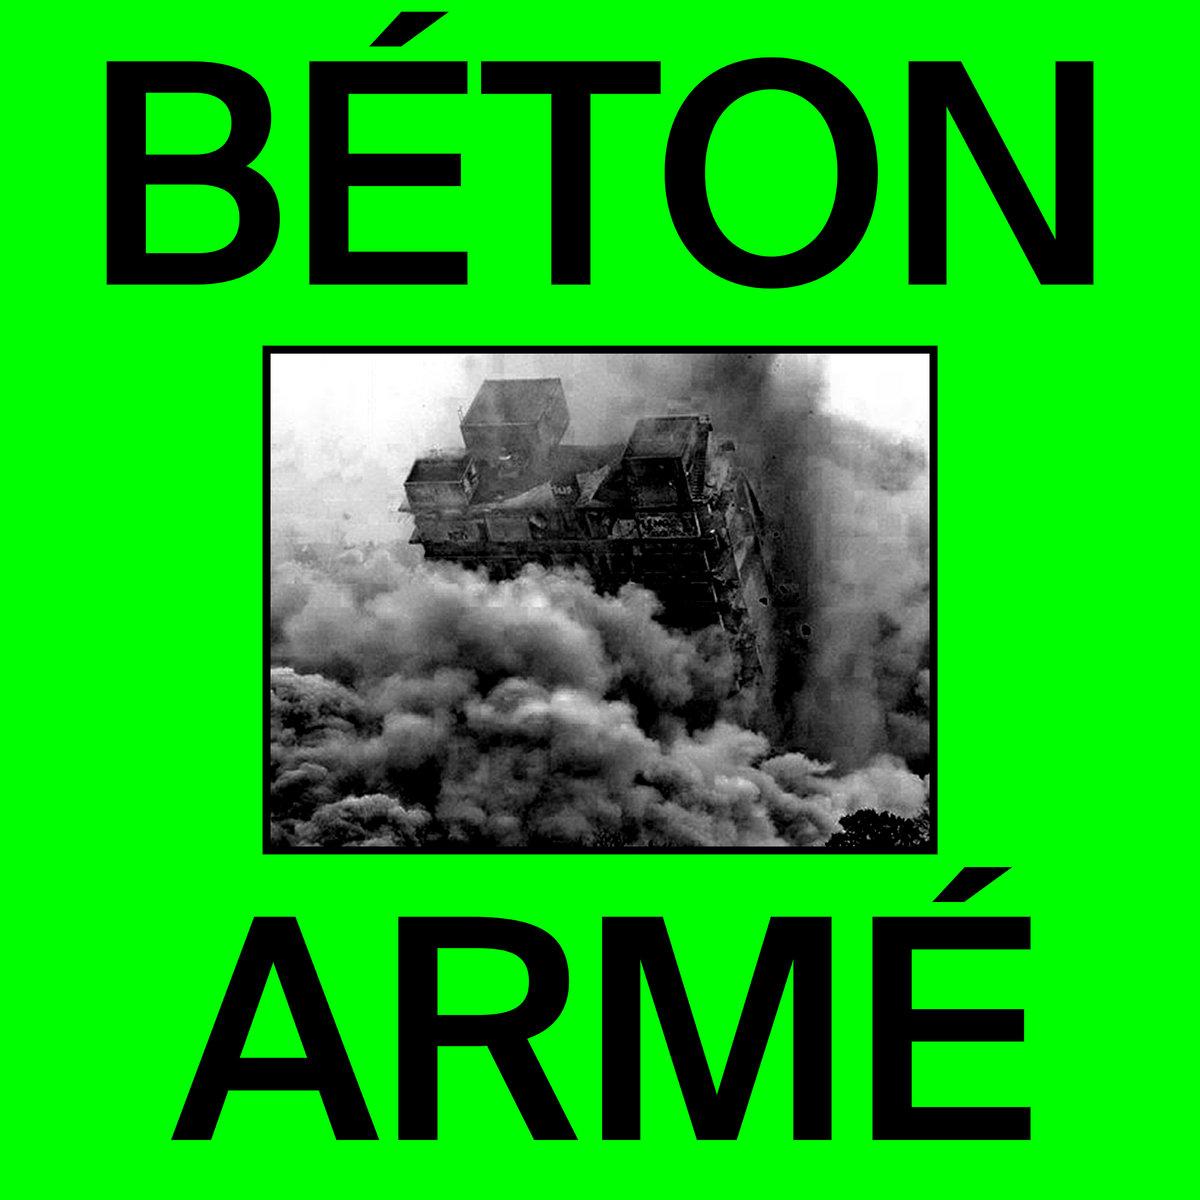 Béton Armé by Bagarre